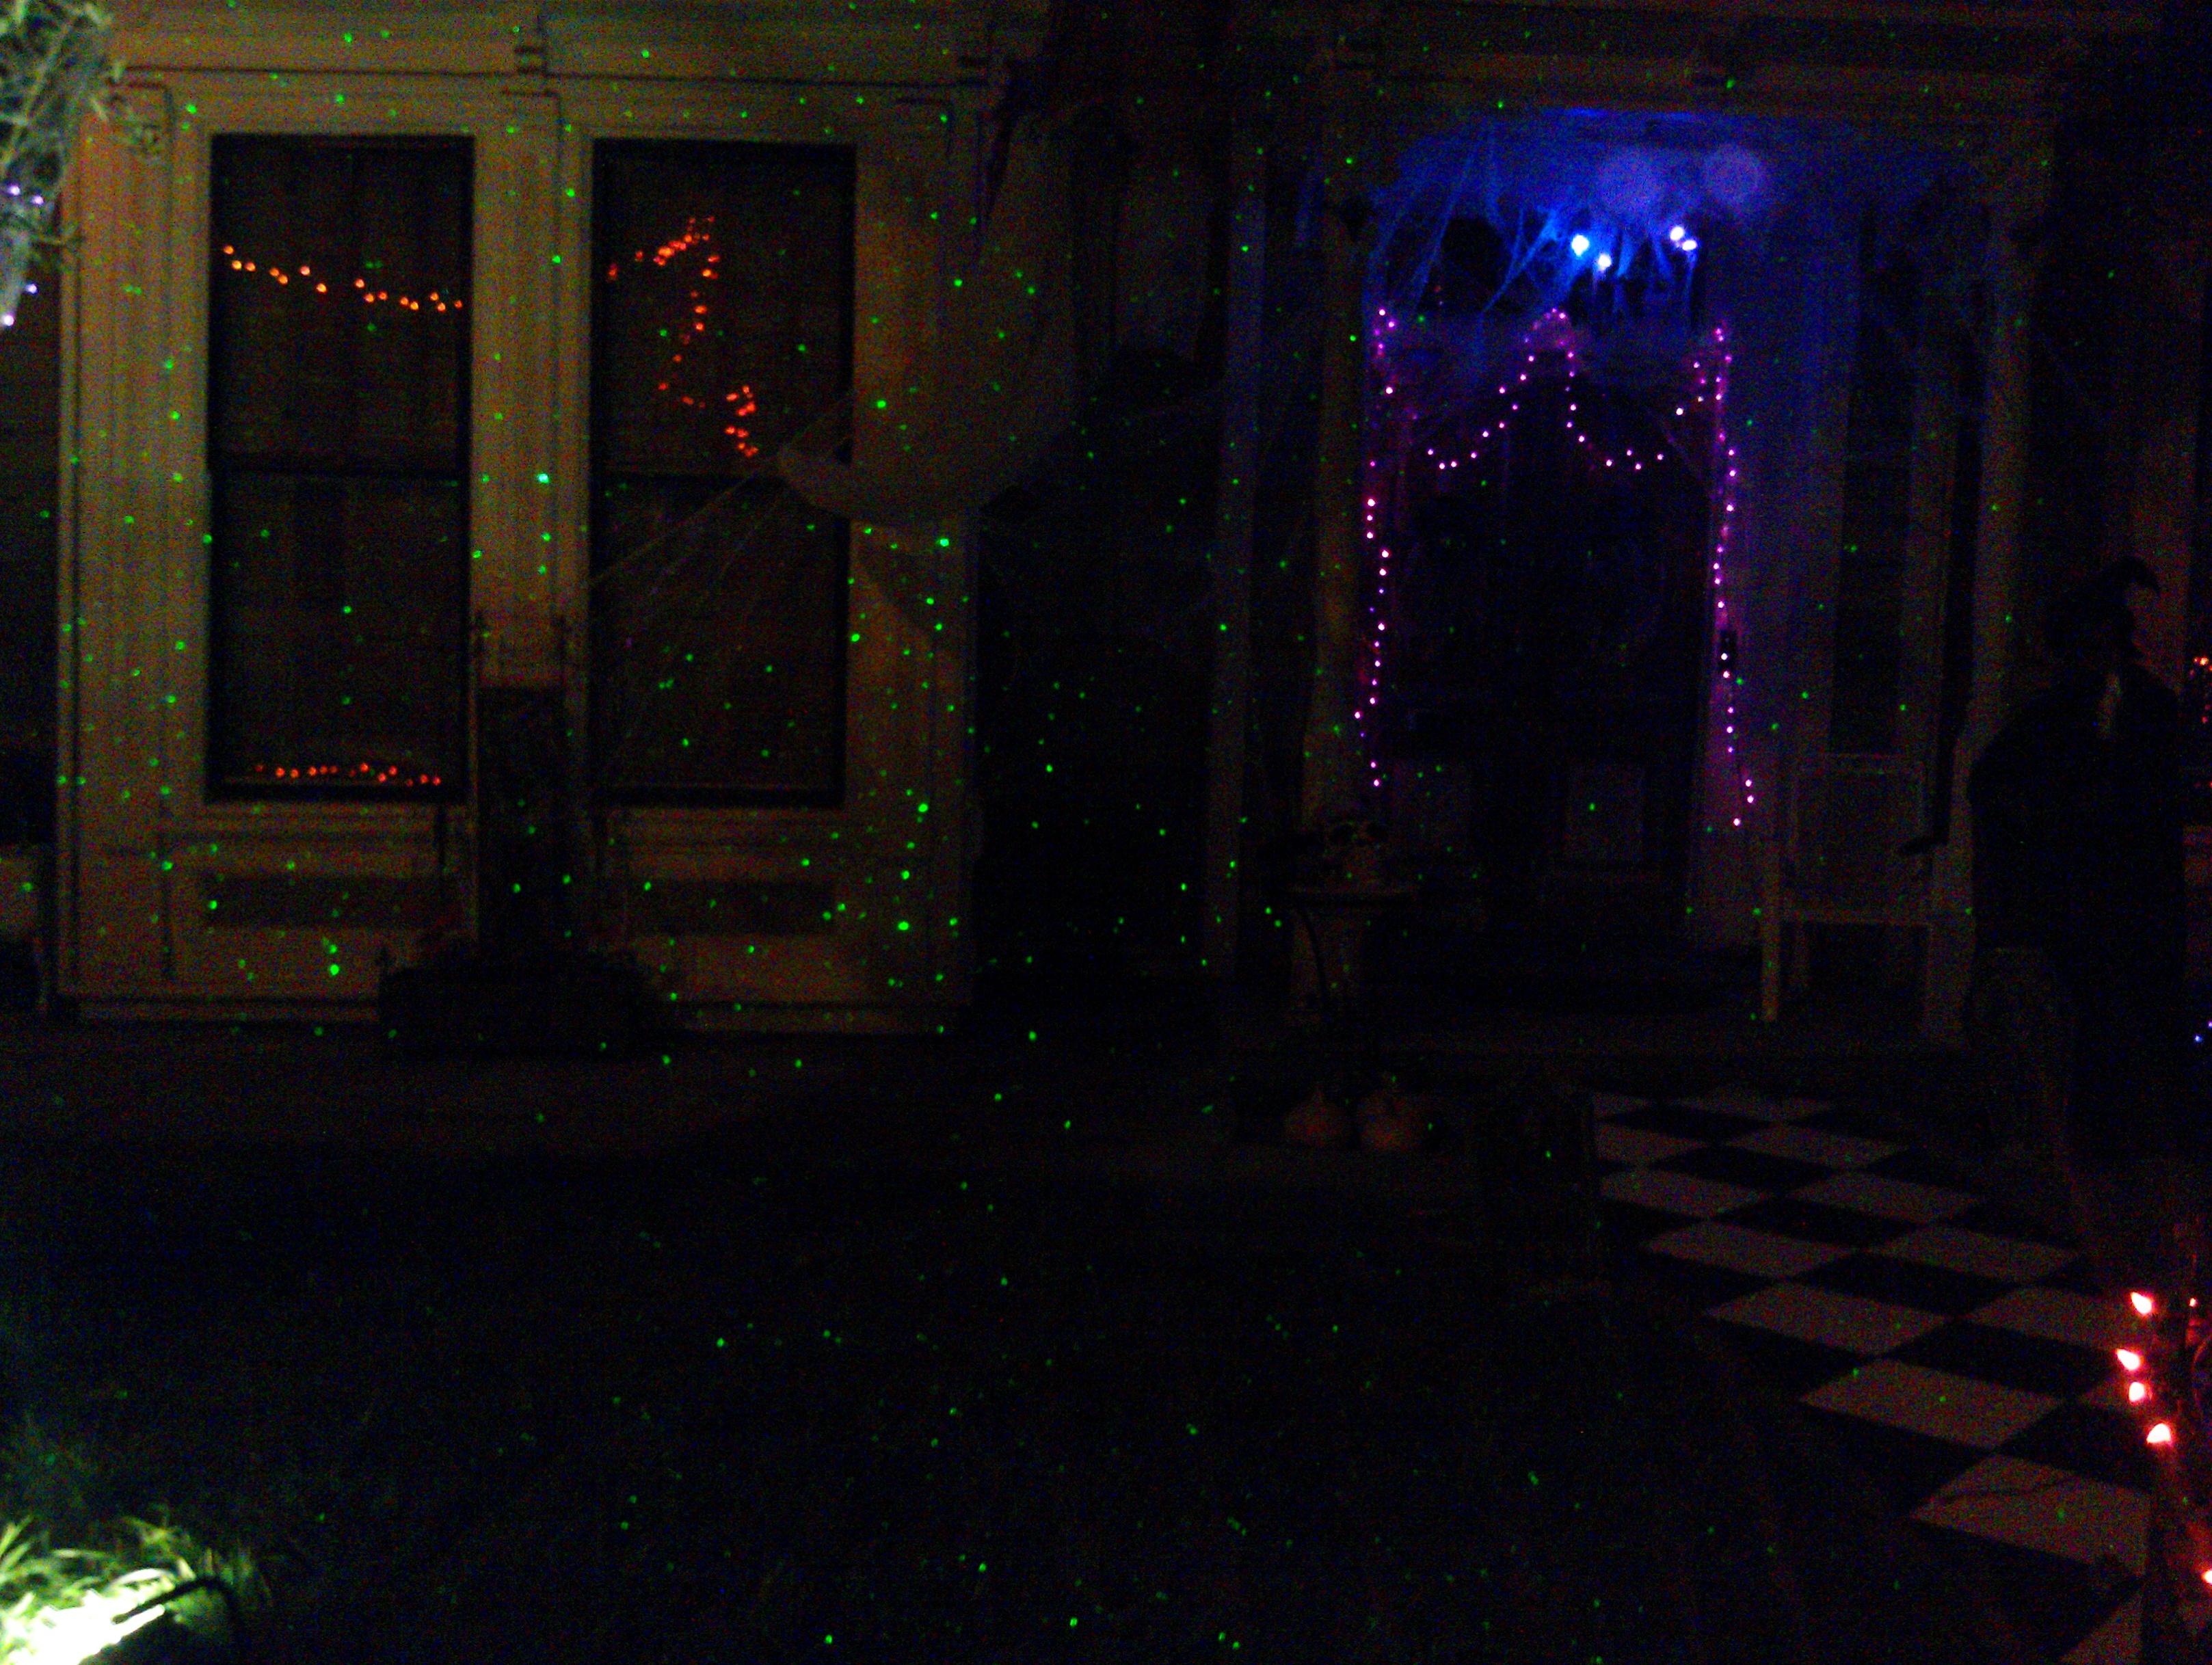 Laser Starfields For Halloween Yard Displays In Nevada